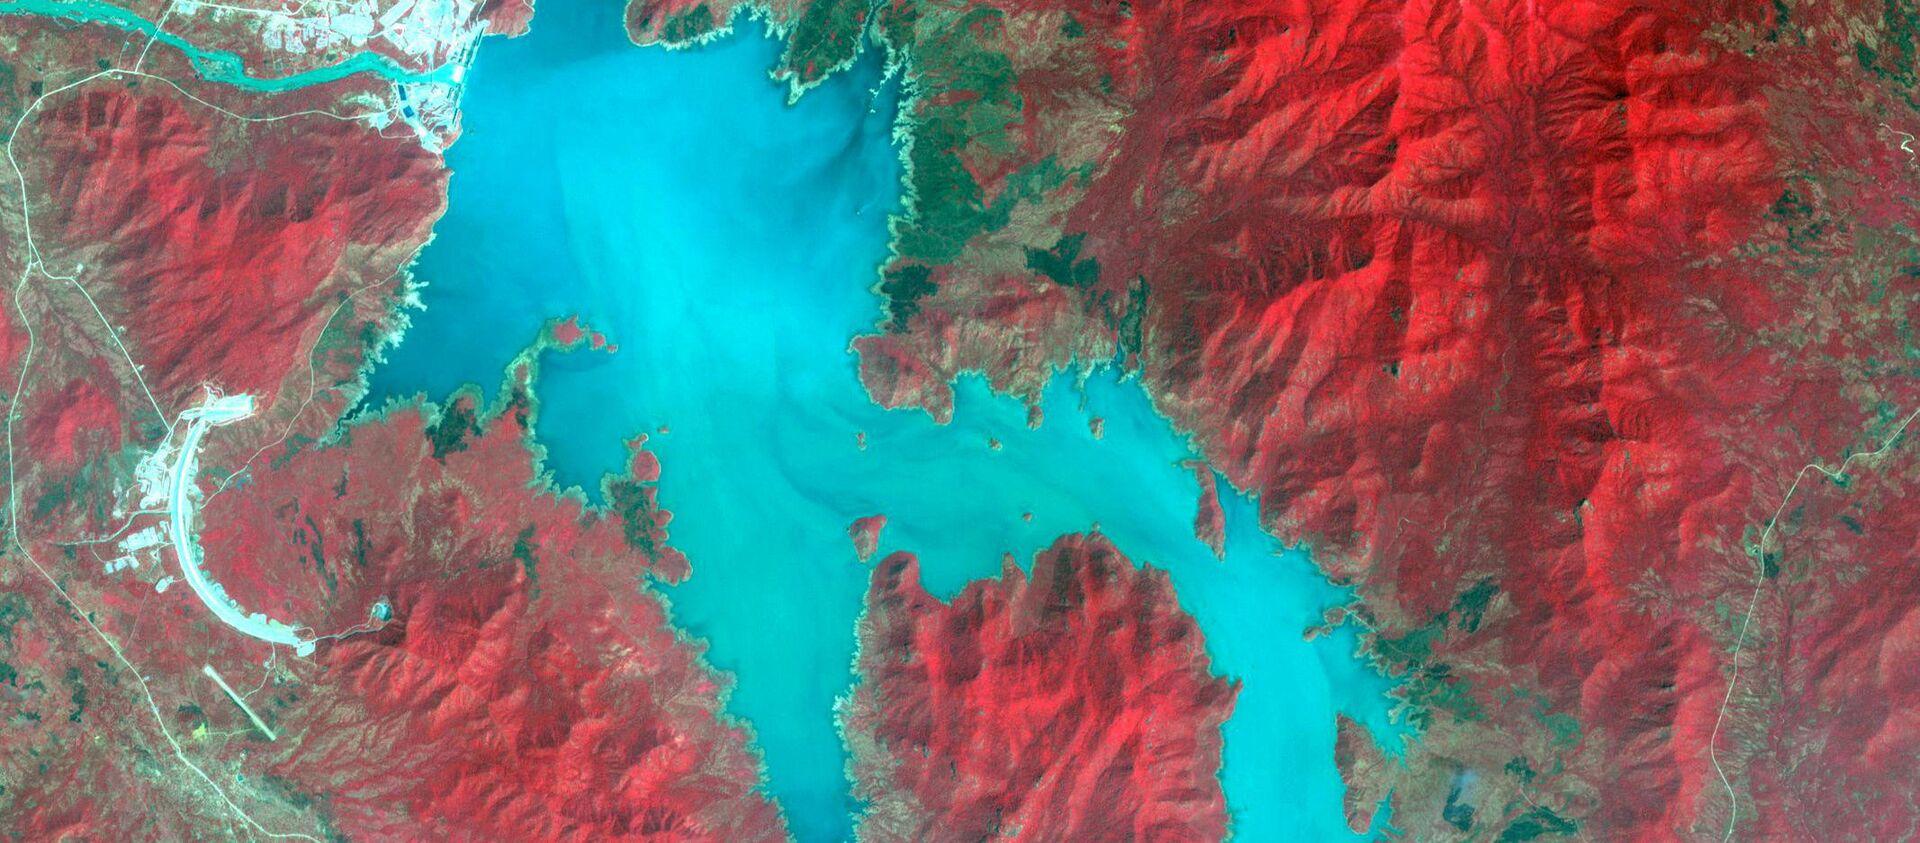 The Blue Nile River is seen as the Grand Ethiopian Renaissance Dam reservoir fills near the Ethiopia-Sudan border, in this broad spectral image taken November 6, 2020 - Sputnik International, 1920, 08.04.2021